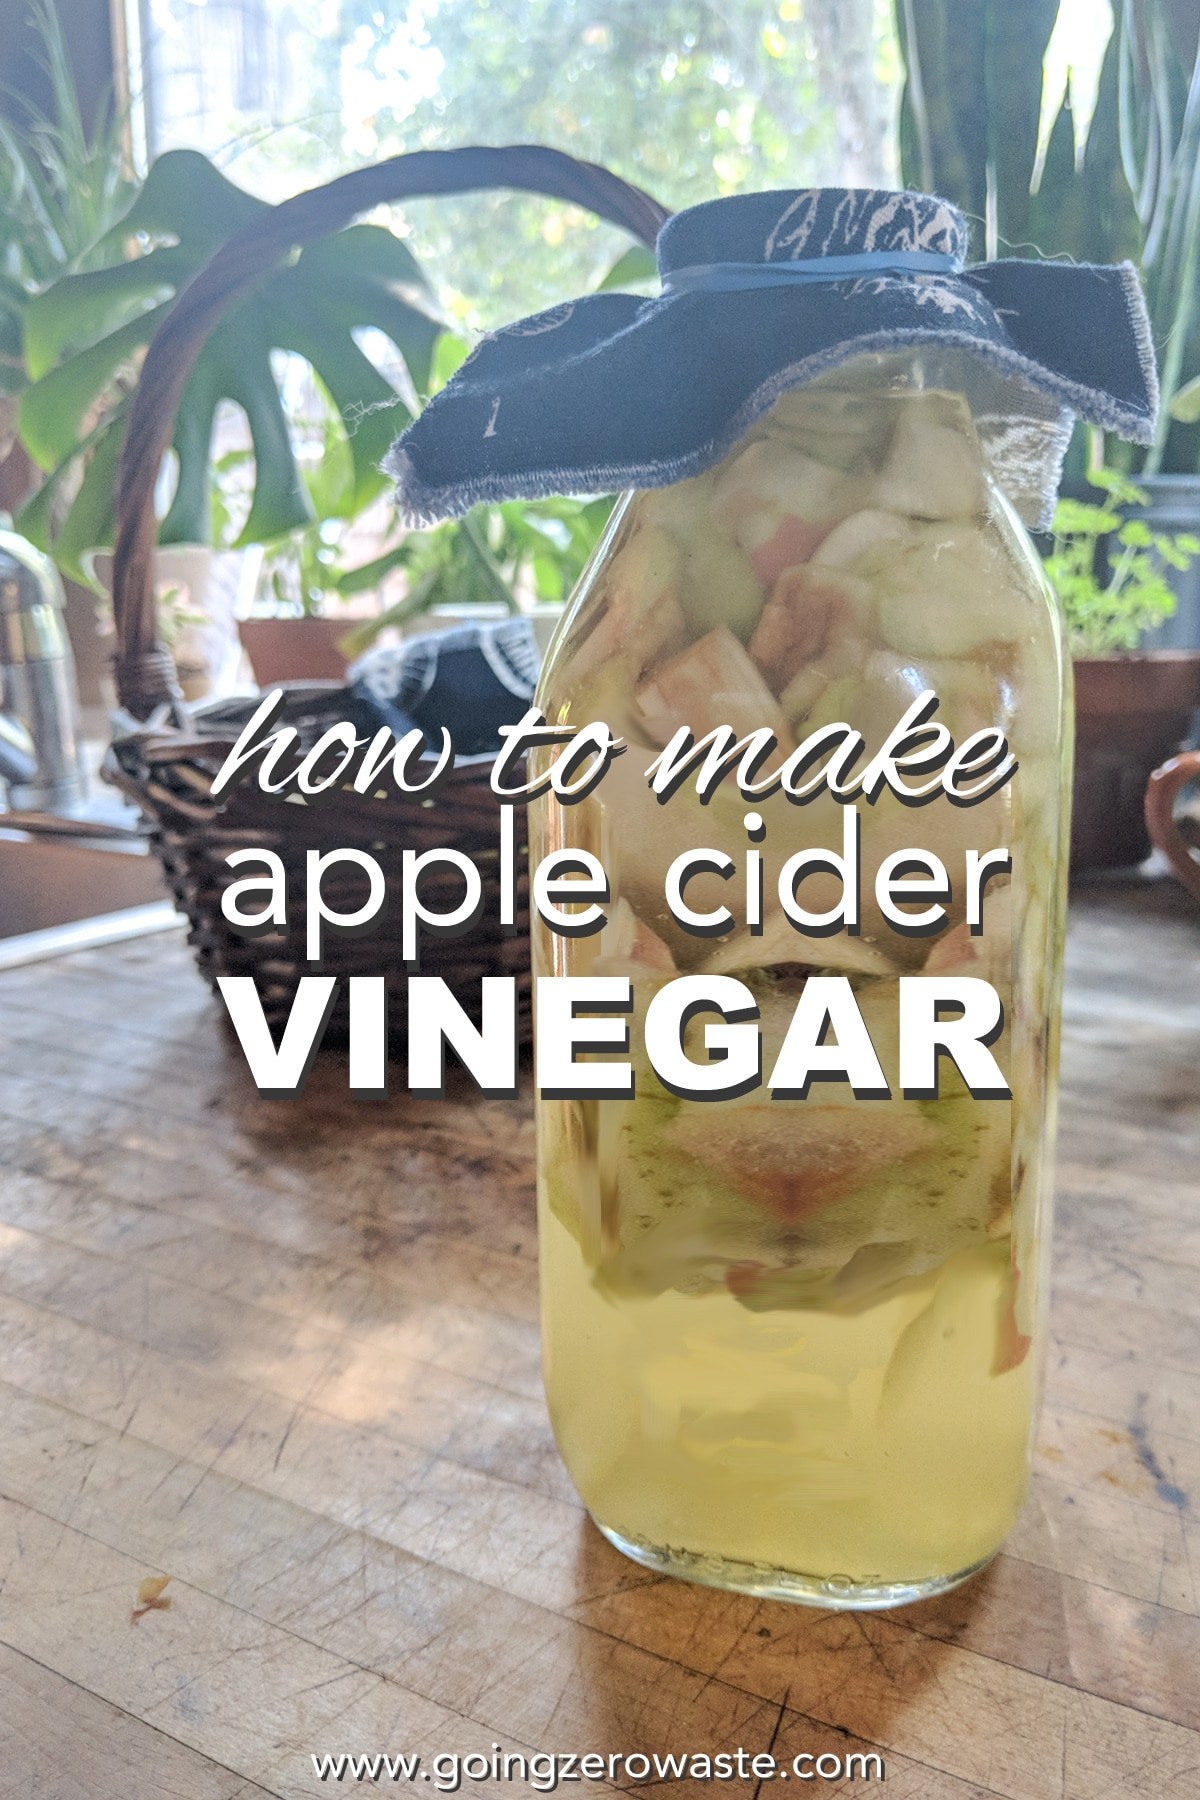 How to Make Apple Cider Vinegar from Scraps